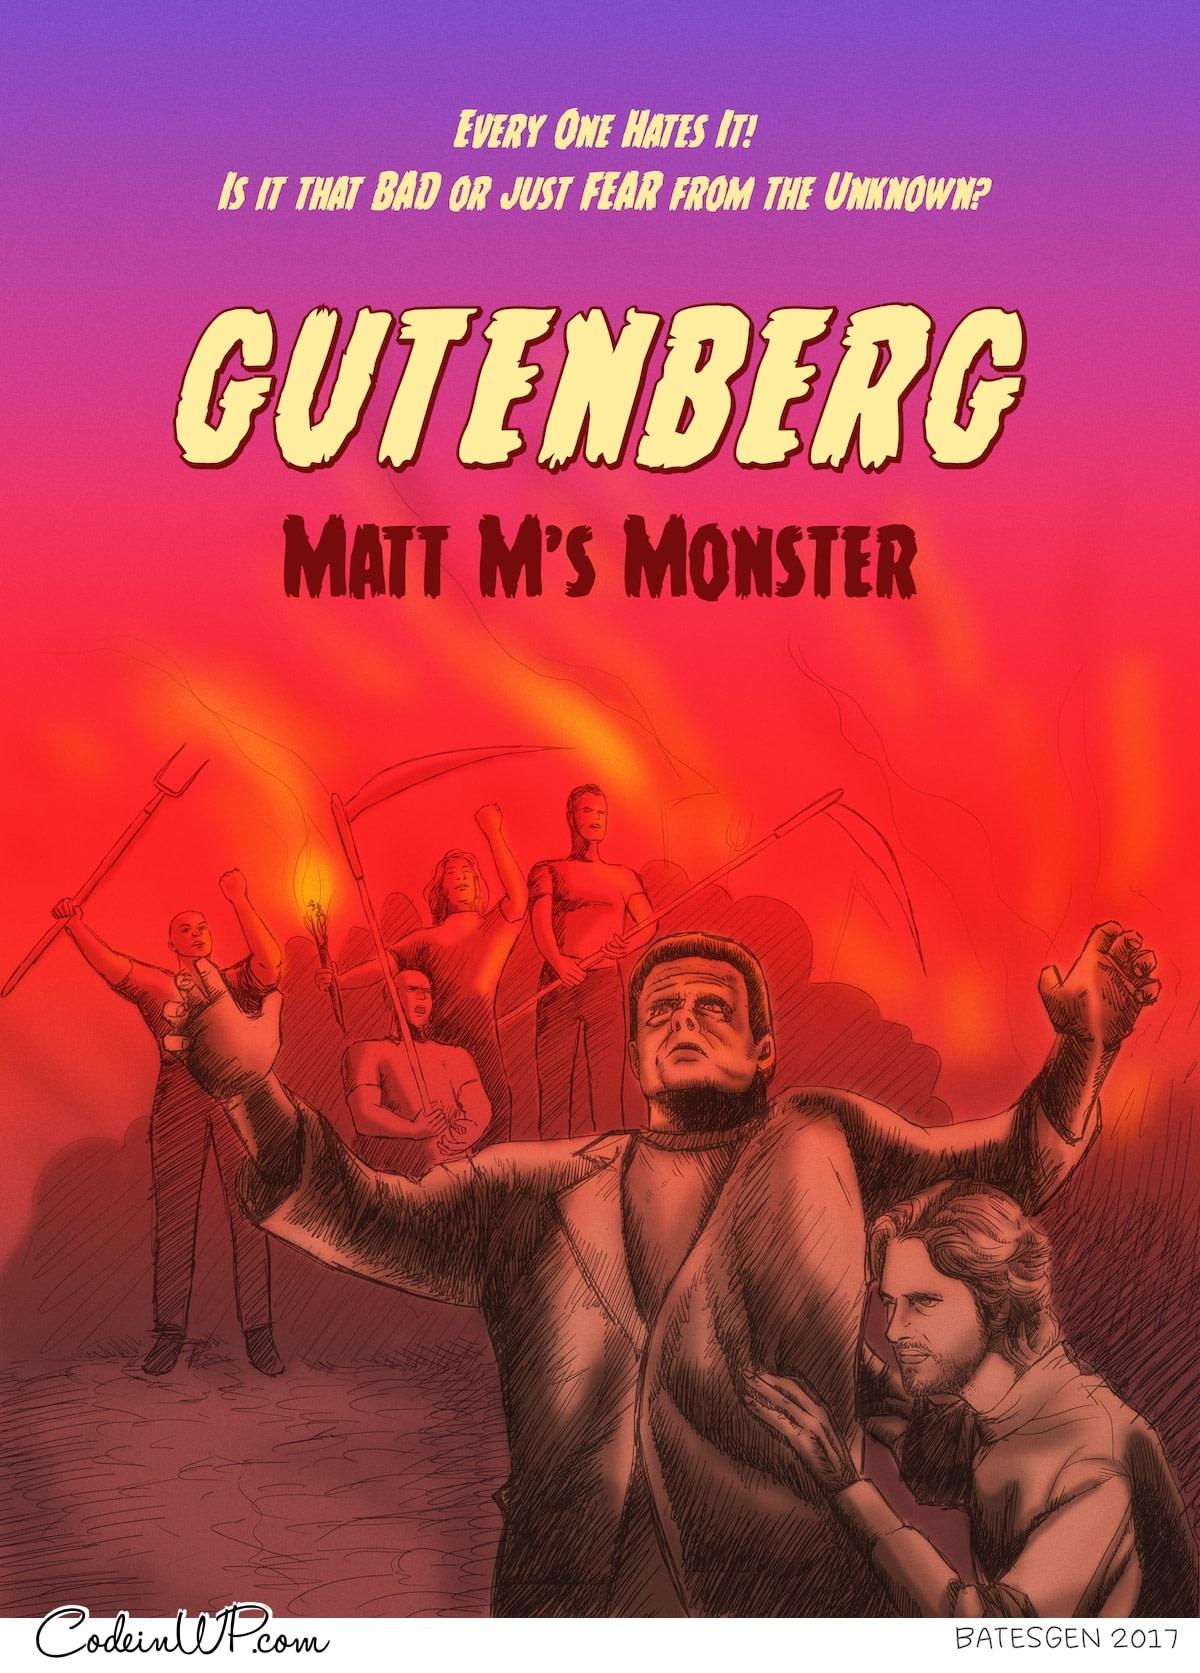 Gutenberg, is still not core. Not yet